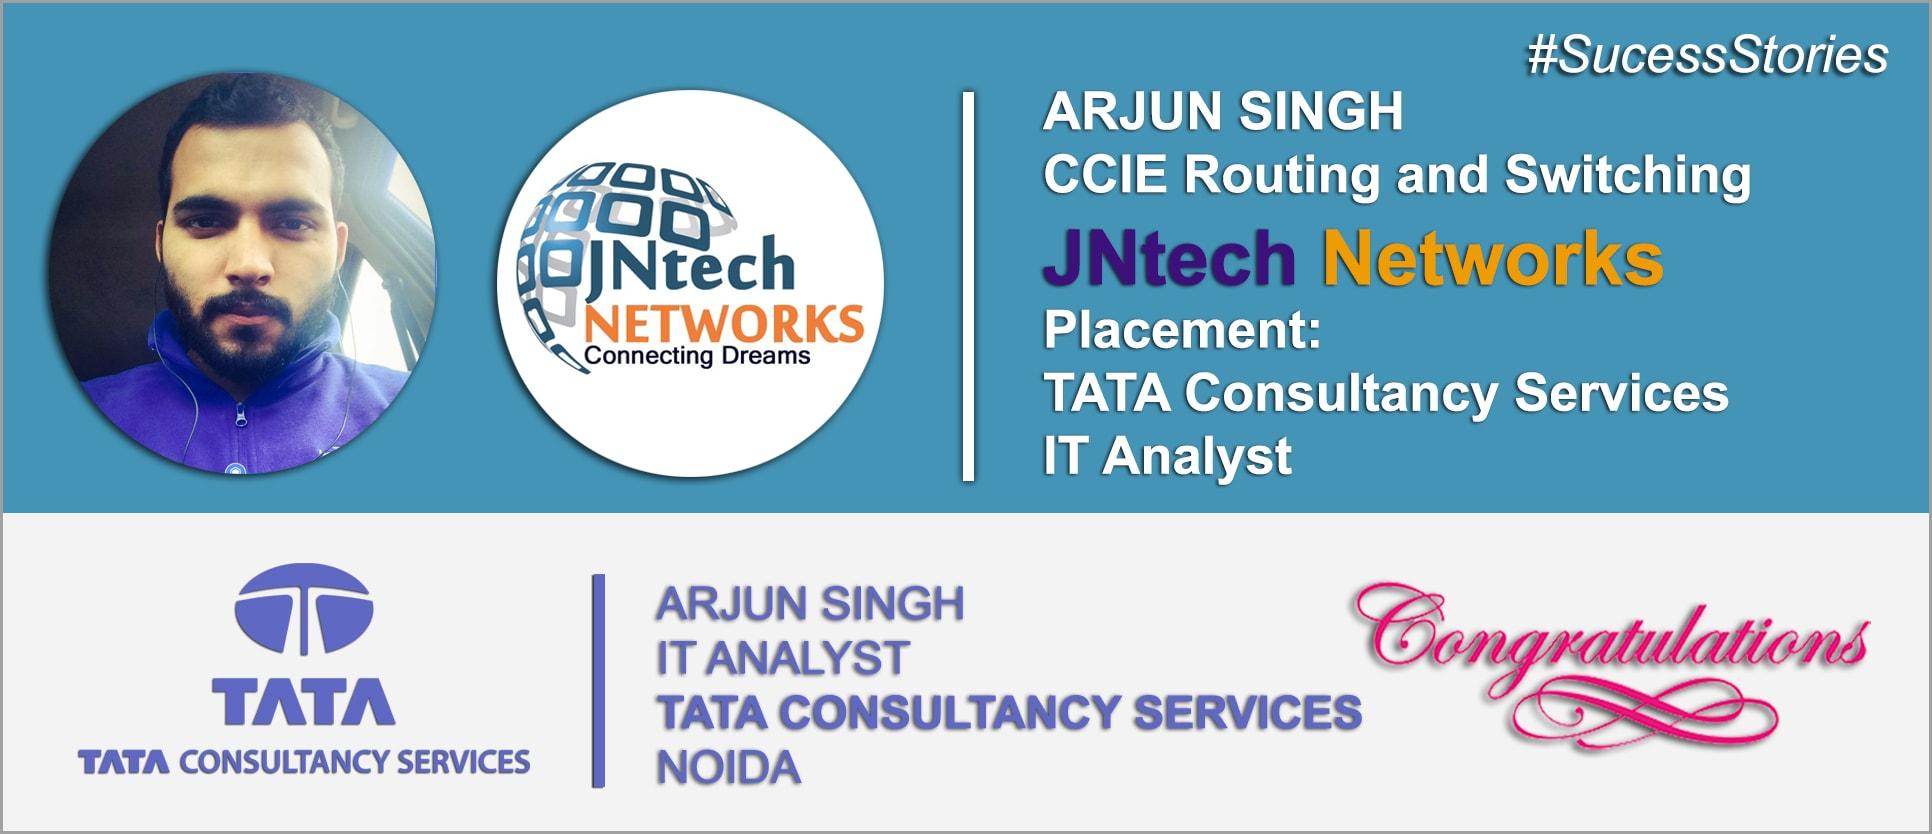 JNtech Networks | CCNA | CCNP | CCIE | AWS | Palo Alto